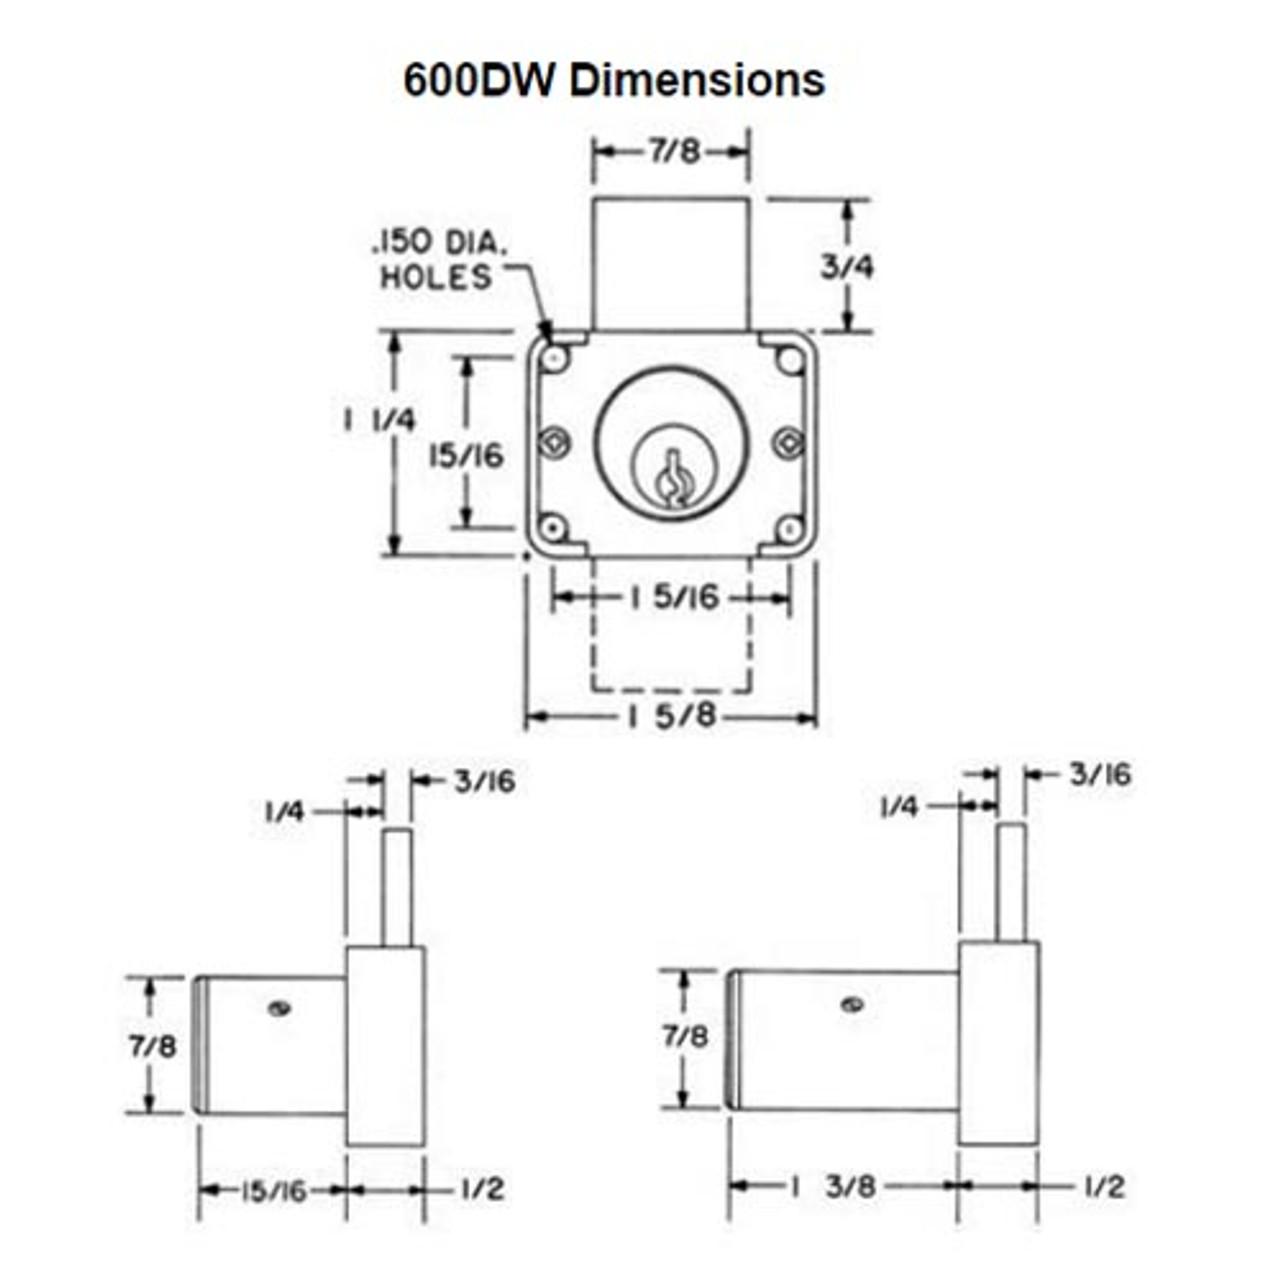 Olympus 600DW-KD-26D-7/8 R Series Drawer Deadbolt Cabinet Locks in Satin Chrome